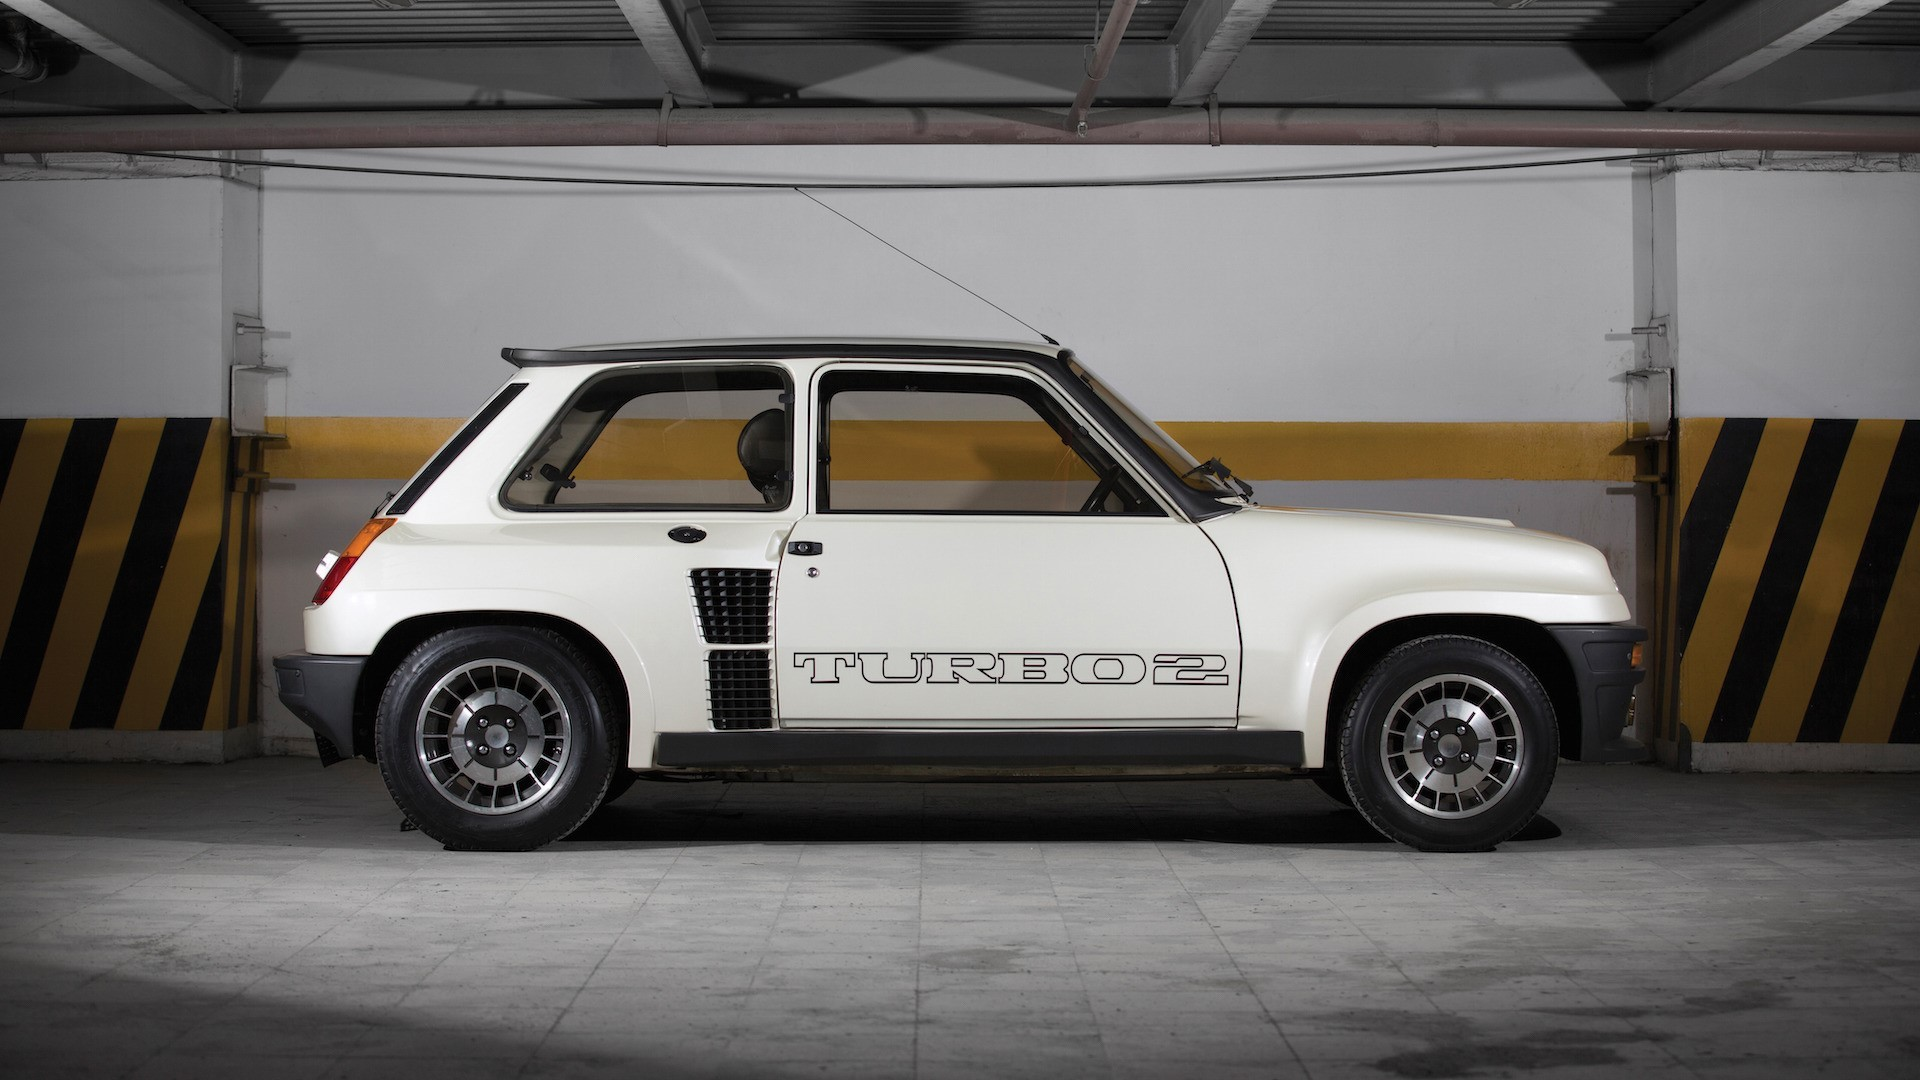 1983-renault-5-turbo-ii-auction (1)